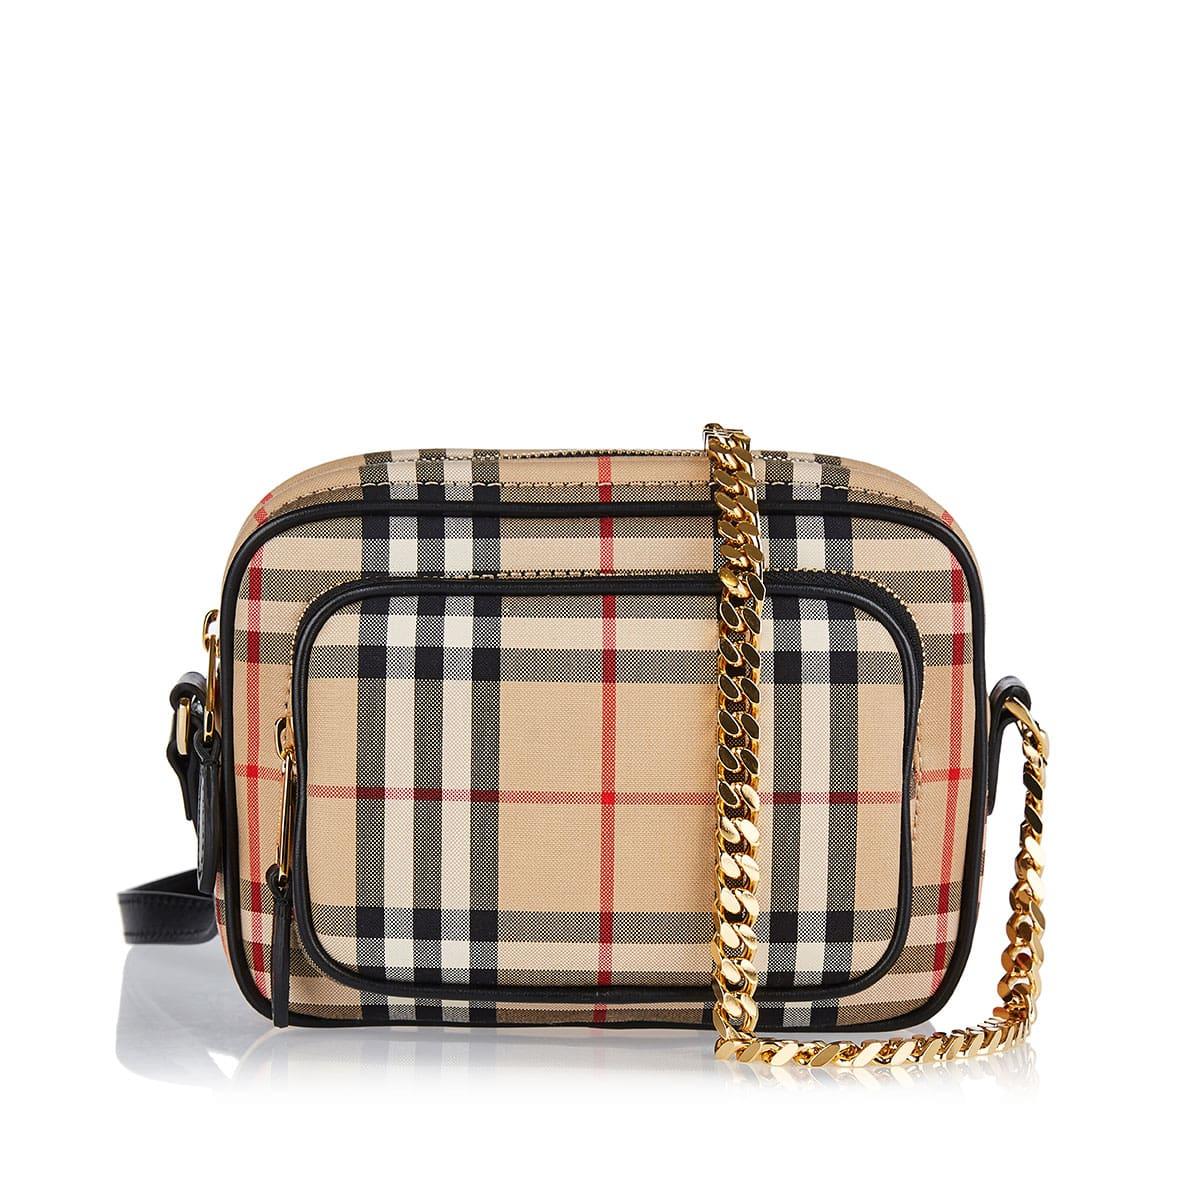 Vintage check cotton camera bag